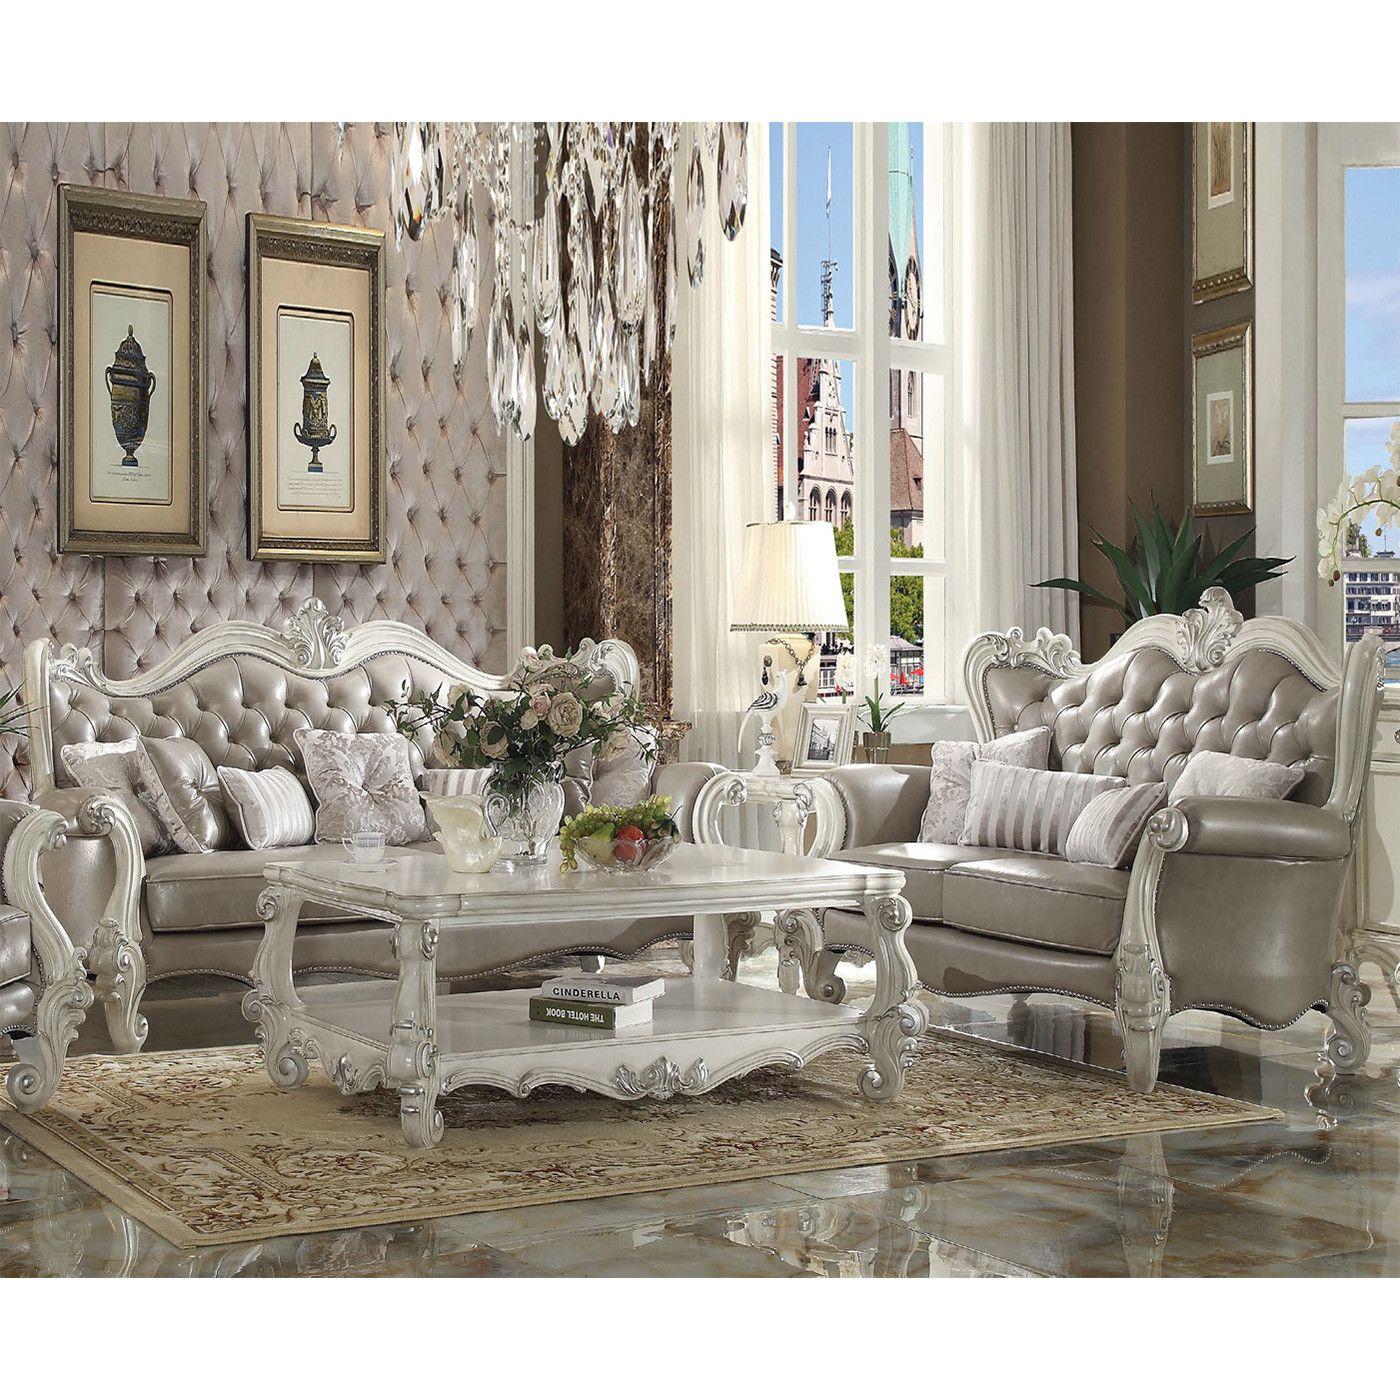 10+ Amazing White Living Room Set Ideas